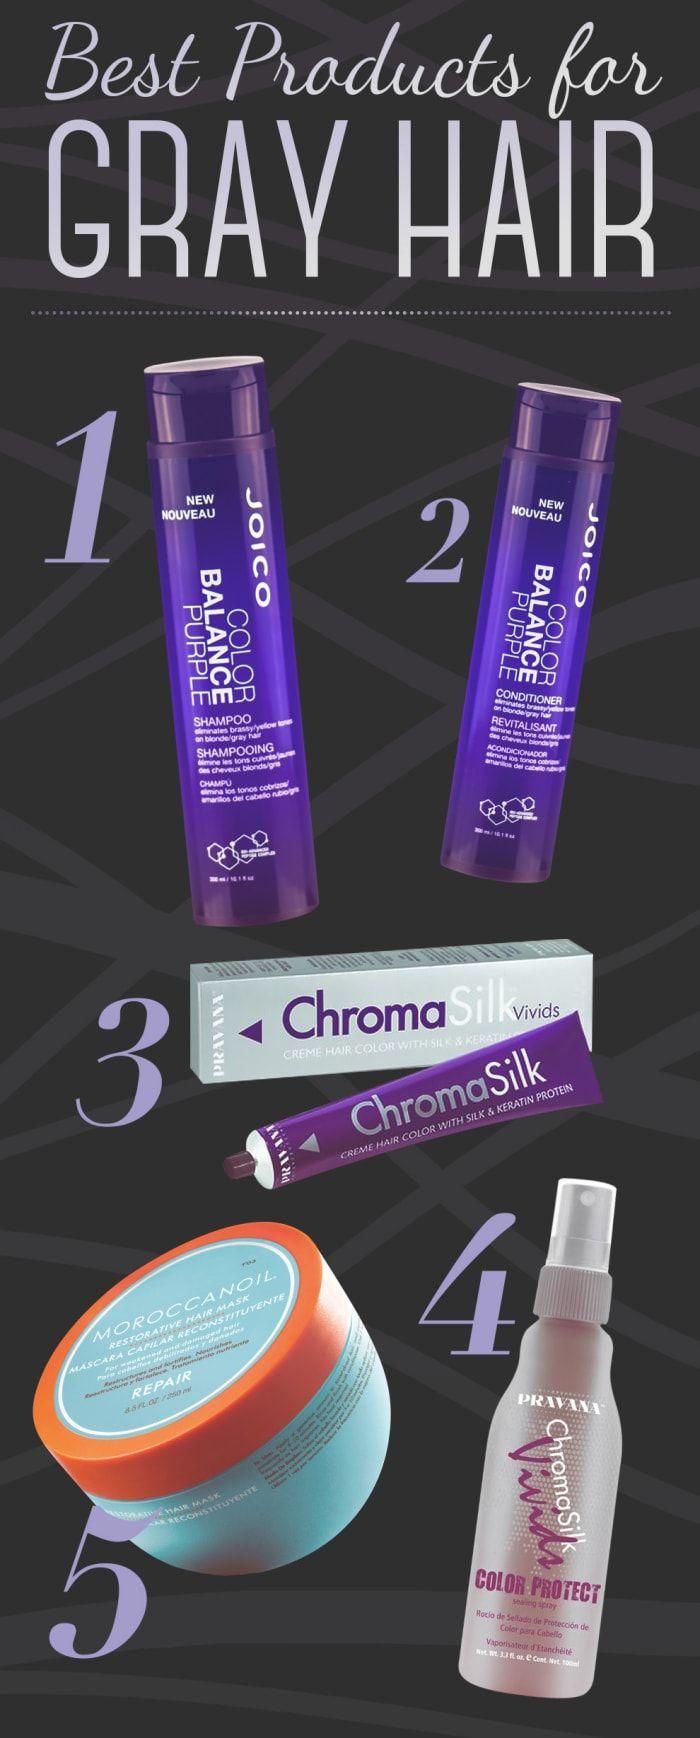 1. Joico Color Balance Purple Shampoo, $162. Joico Color Balance Purple Conditioner, $183. Pravana ChromaSilk Vivids in Silver, $31.994. Pravana ChromaSilk Vivids Color Protect Sealing Spray, $17.10 5. Moroccanoil Repair Mask, $33.99